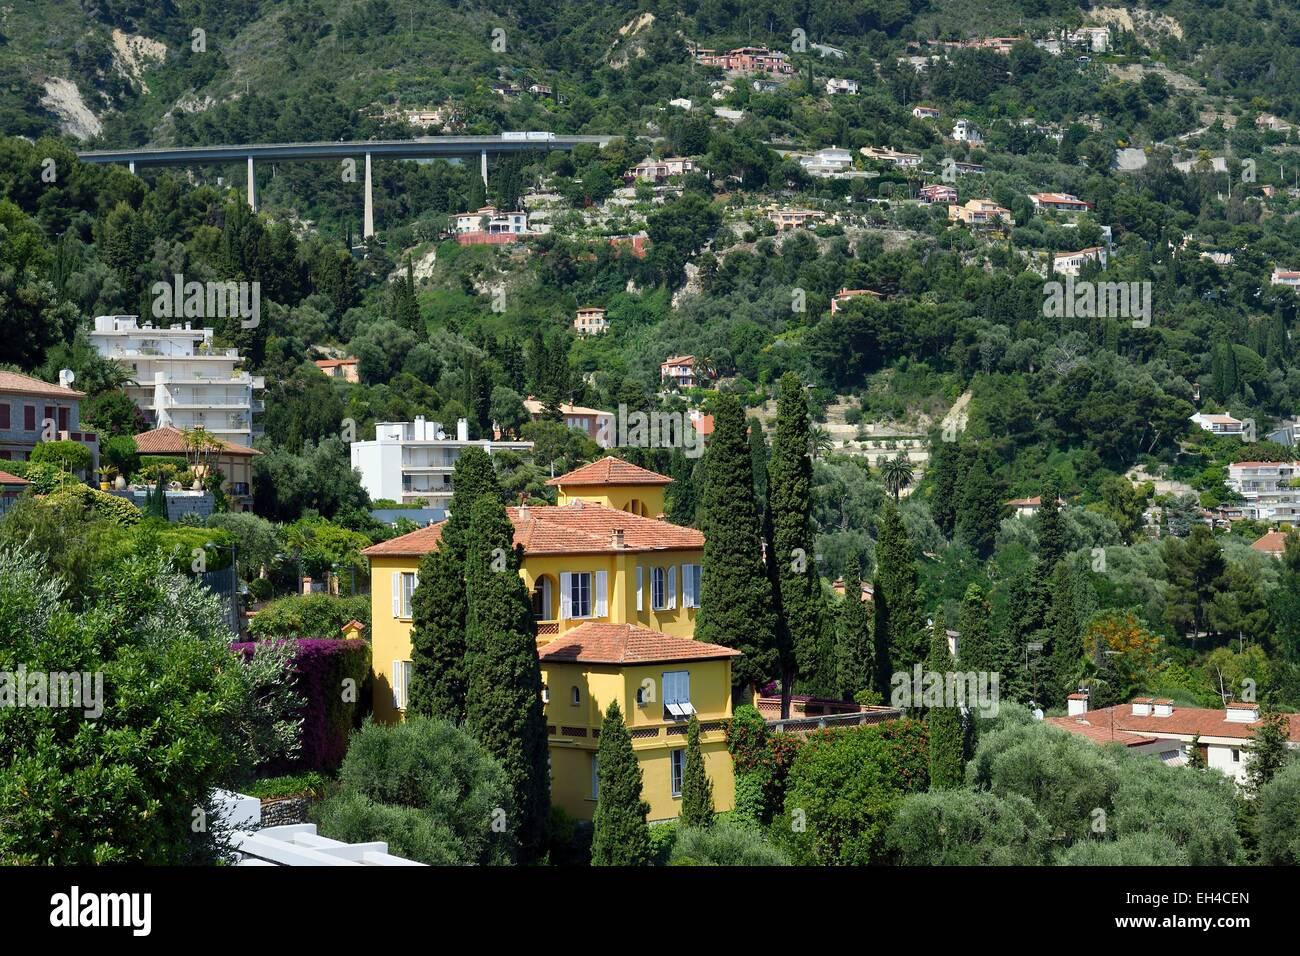 France, Alpes Maritimes, Menton, Garavan district, Regard sur Saint-Antoine villa - Stock Image